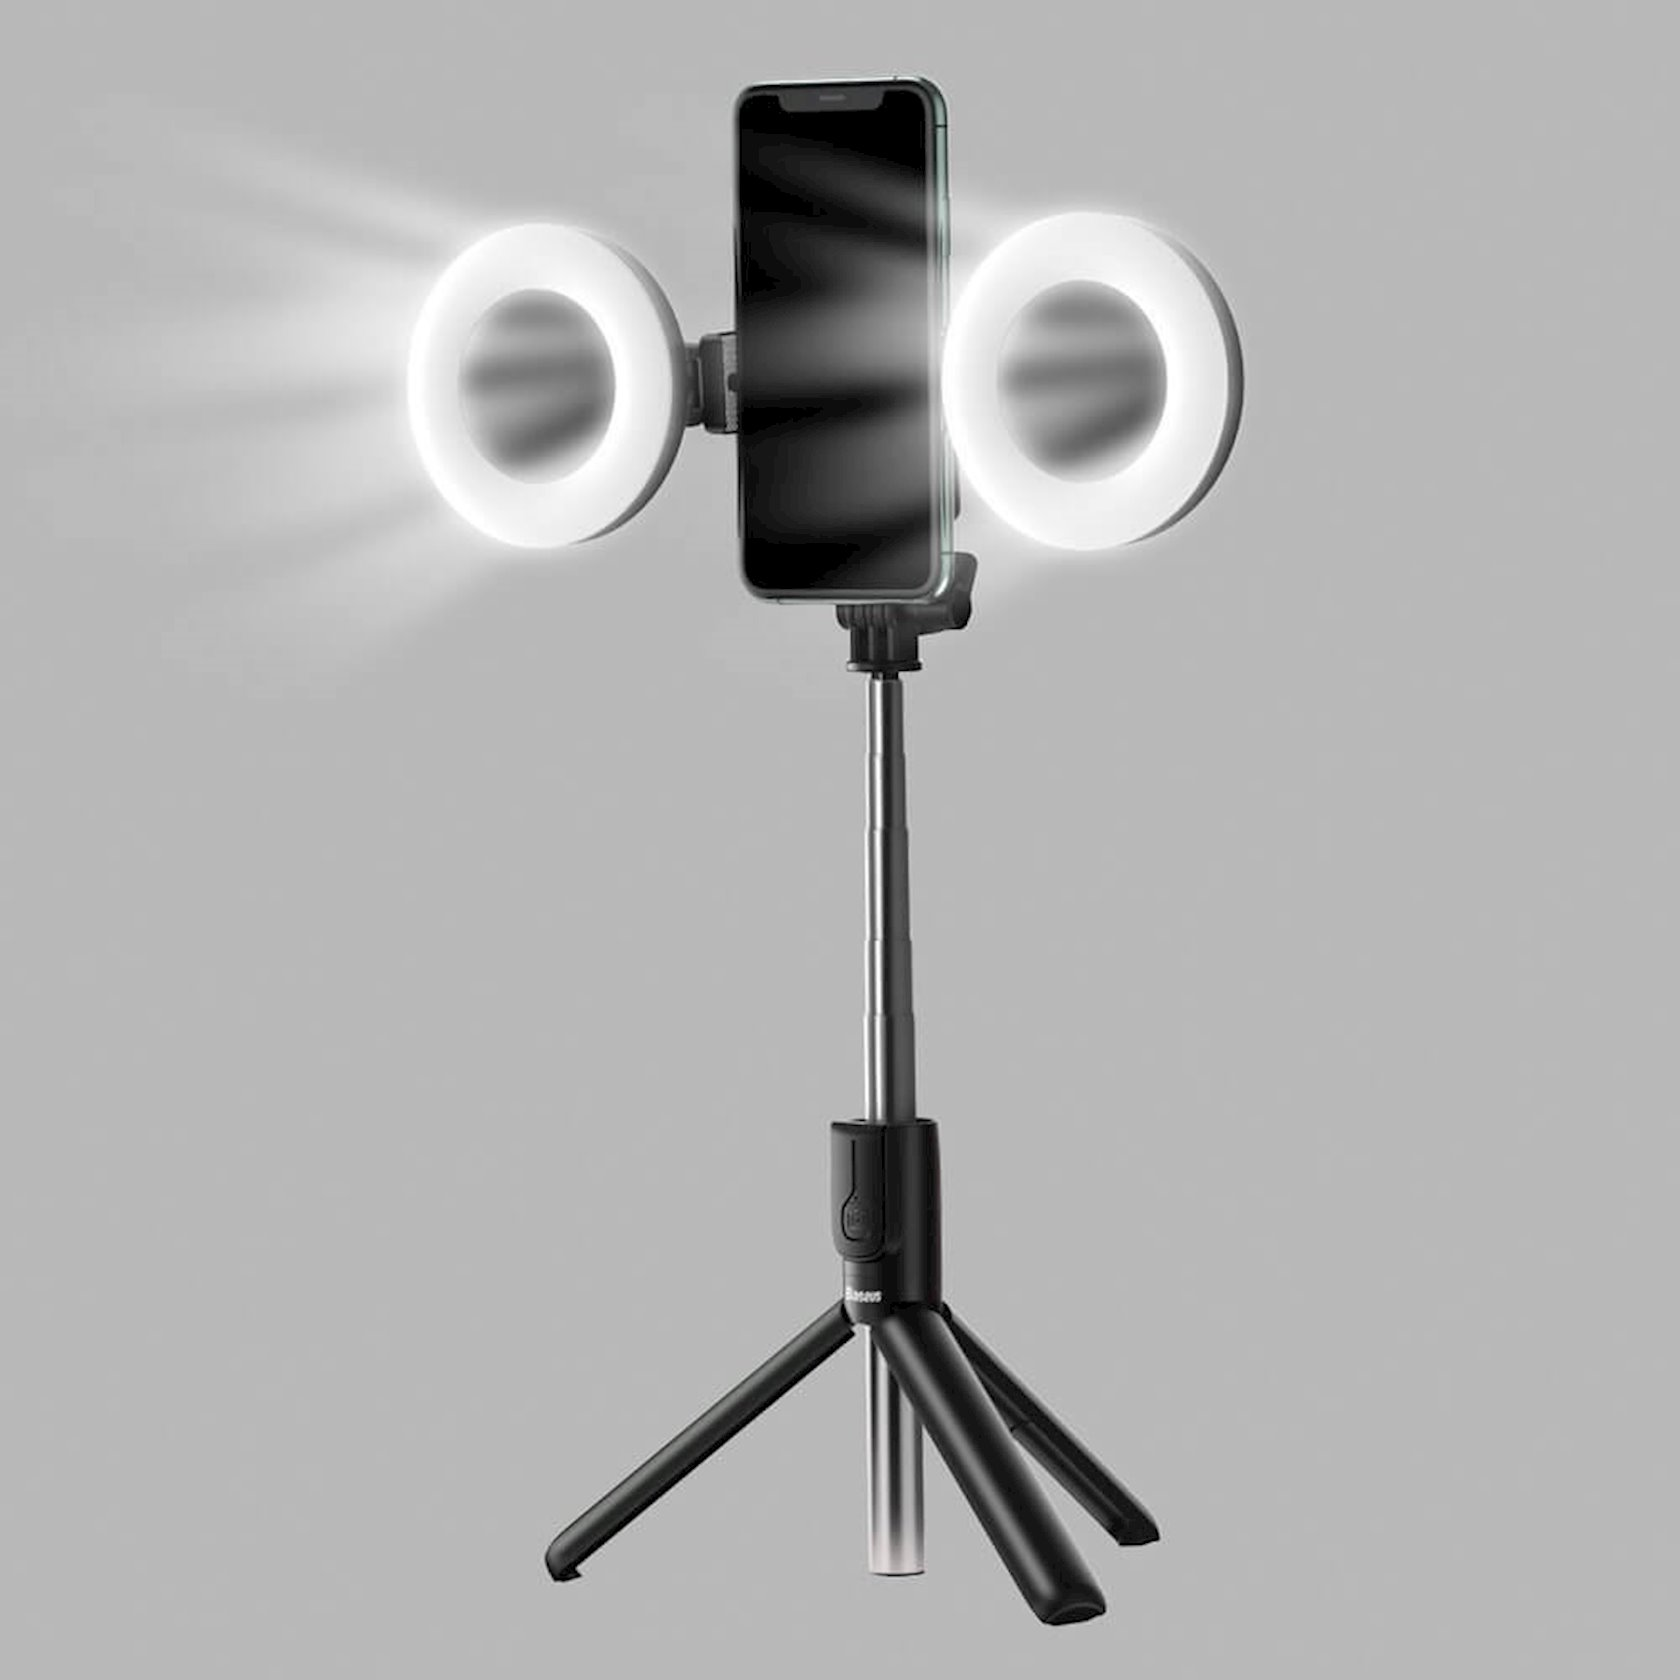 Ştativ  işıq Baseus Lovely Fill Light Accessories Selfie Ring Black